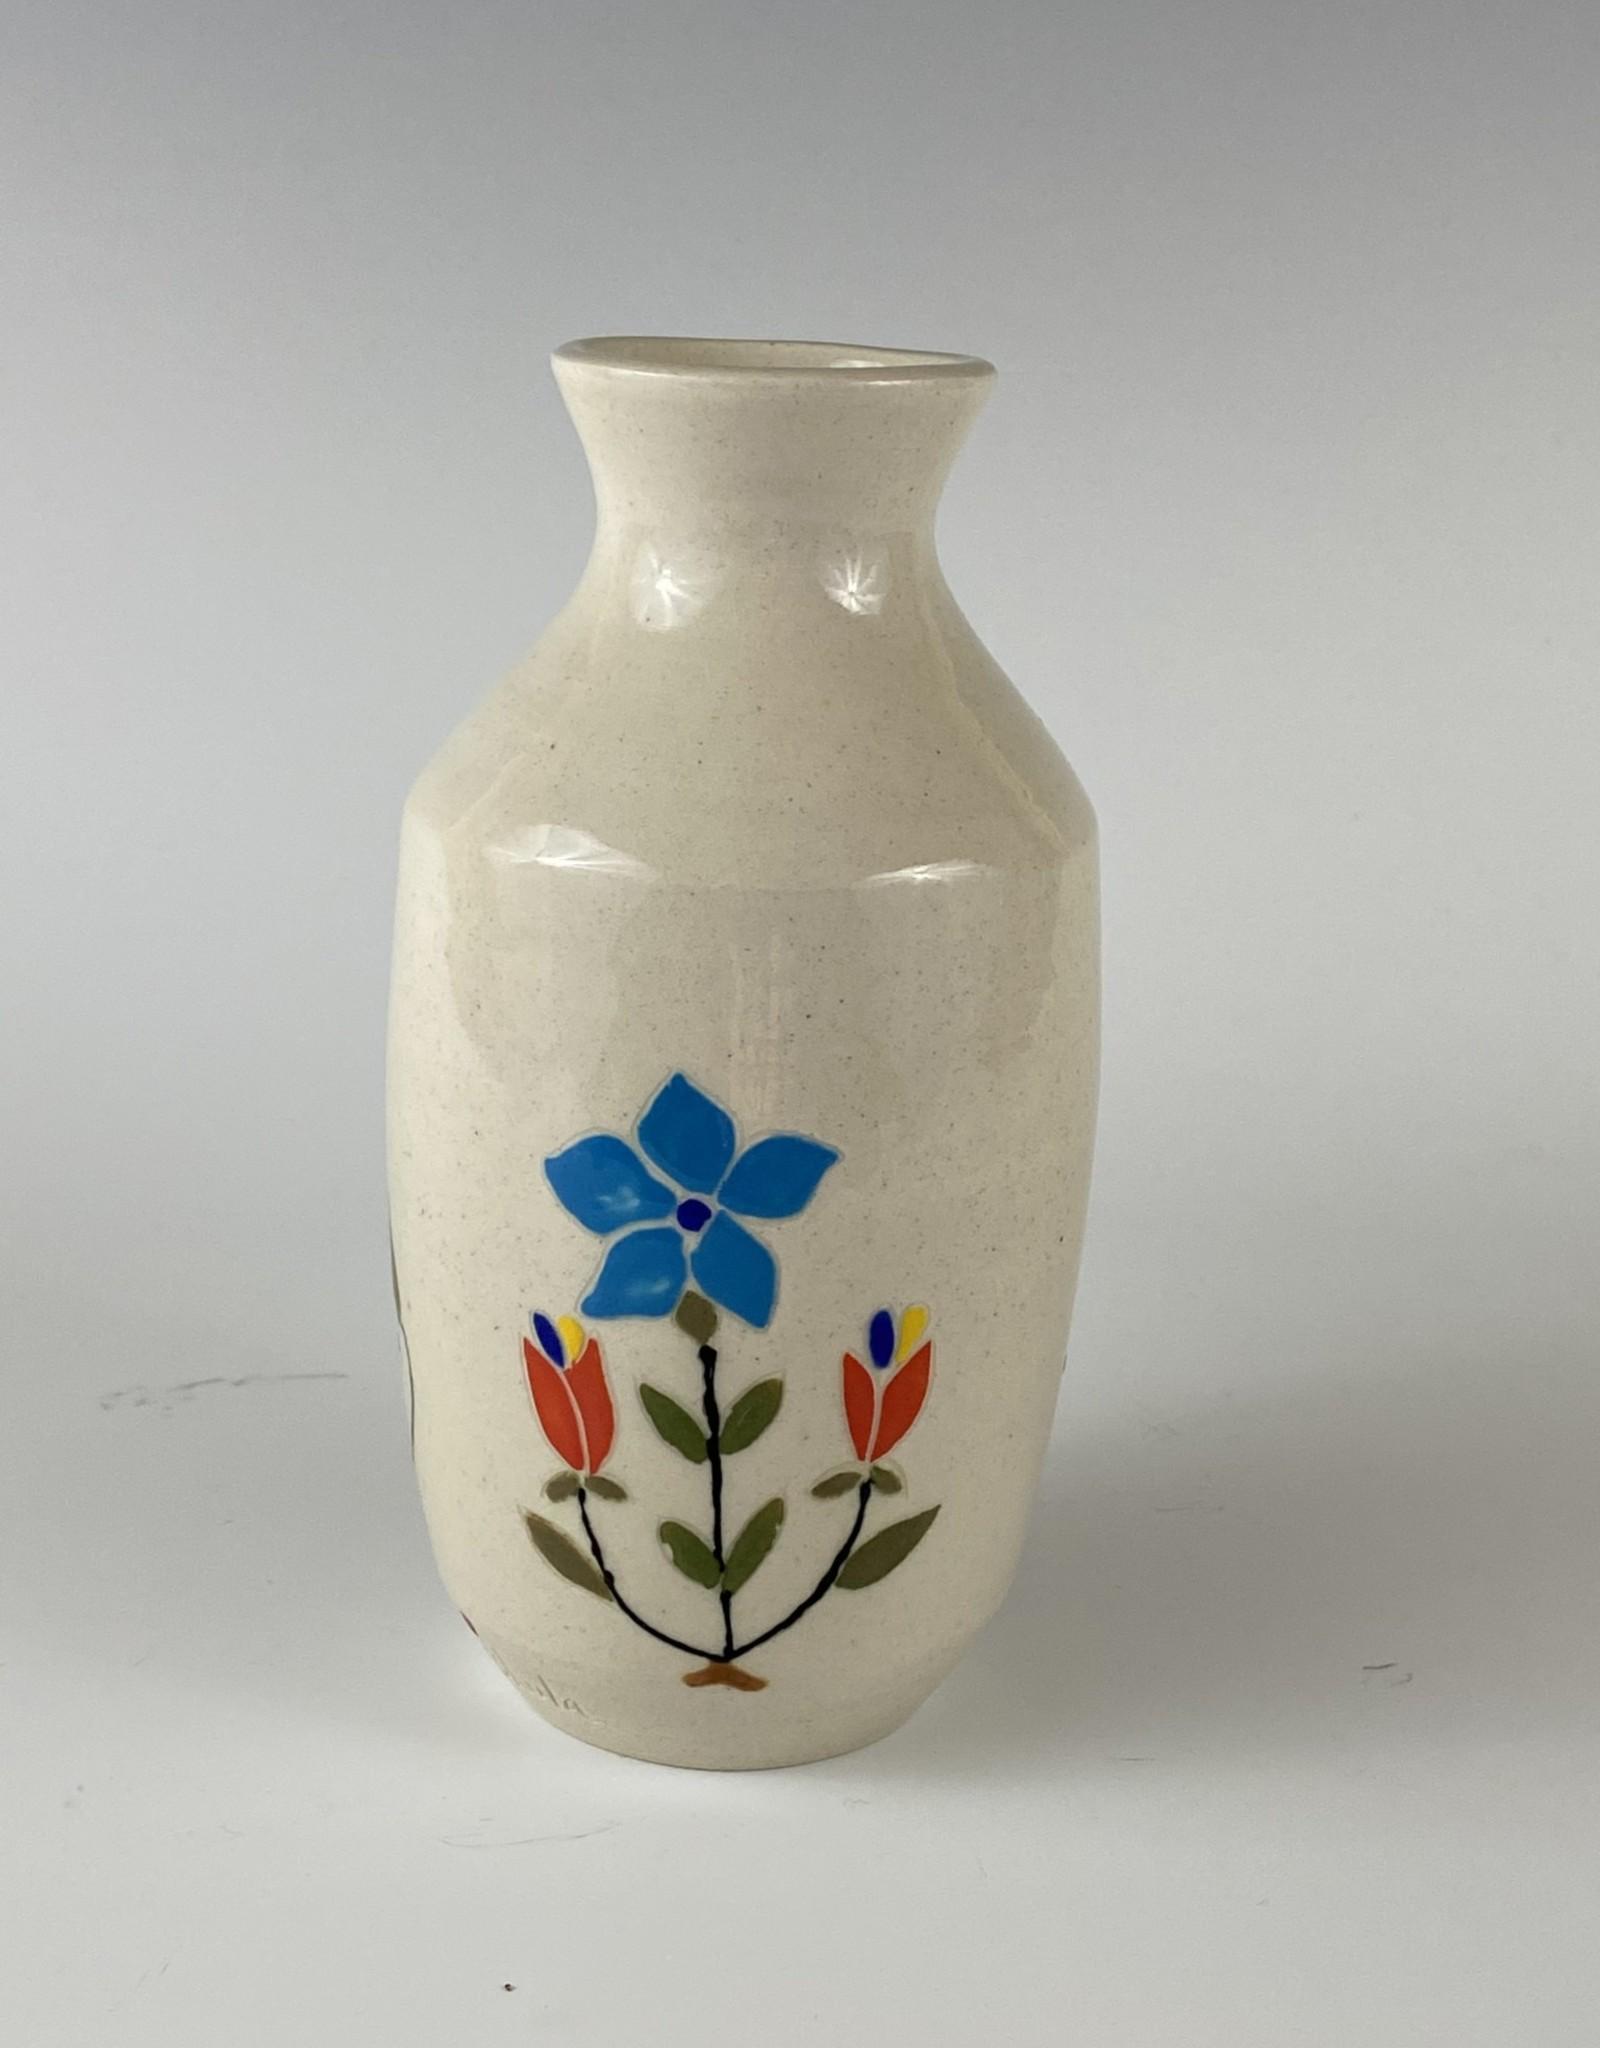 Anshula Tayal Amaati Gulistan small Vase